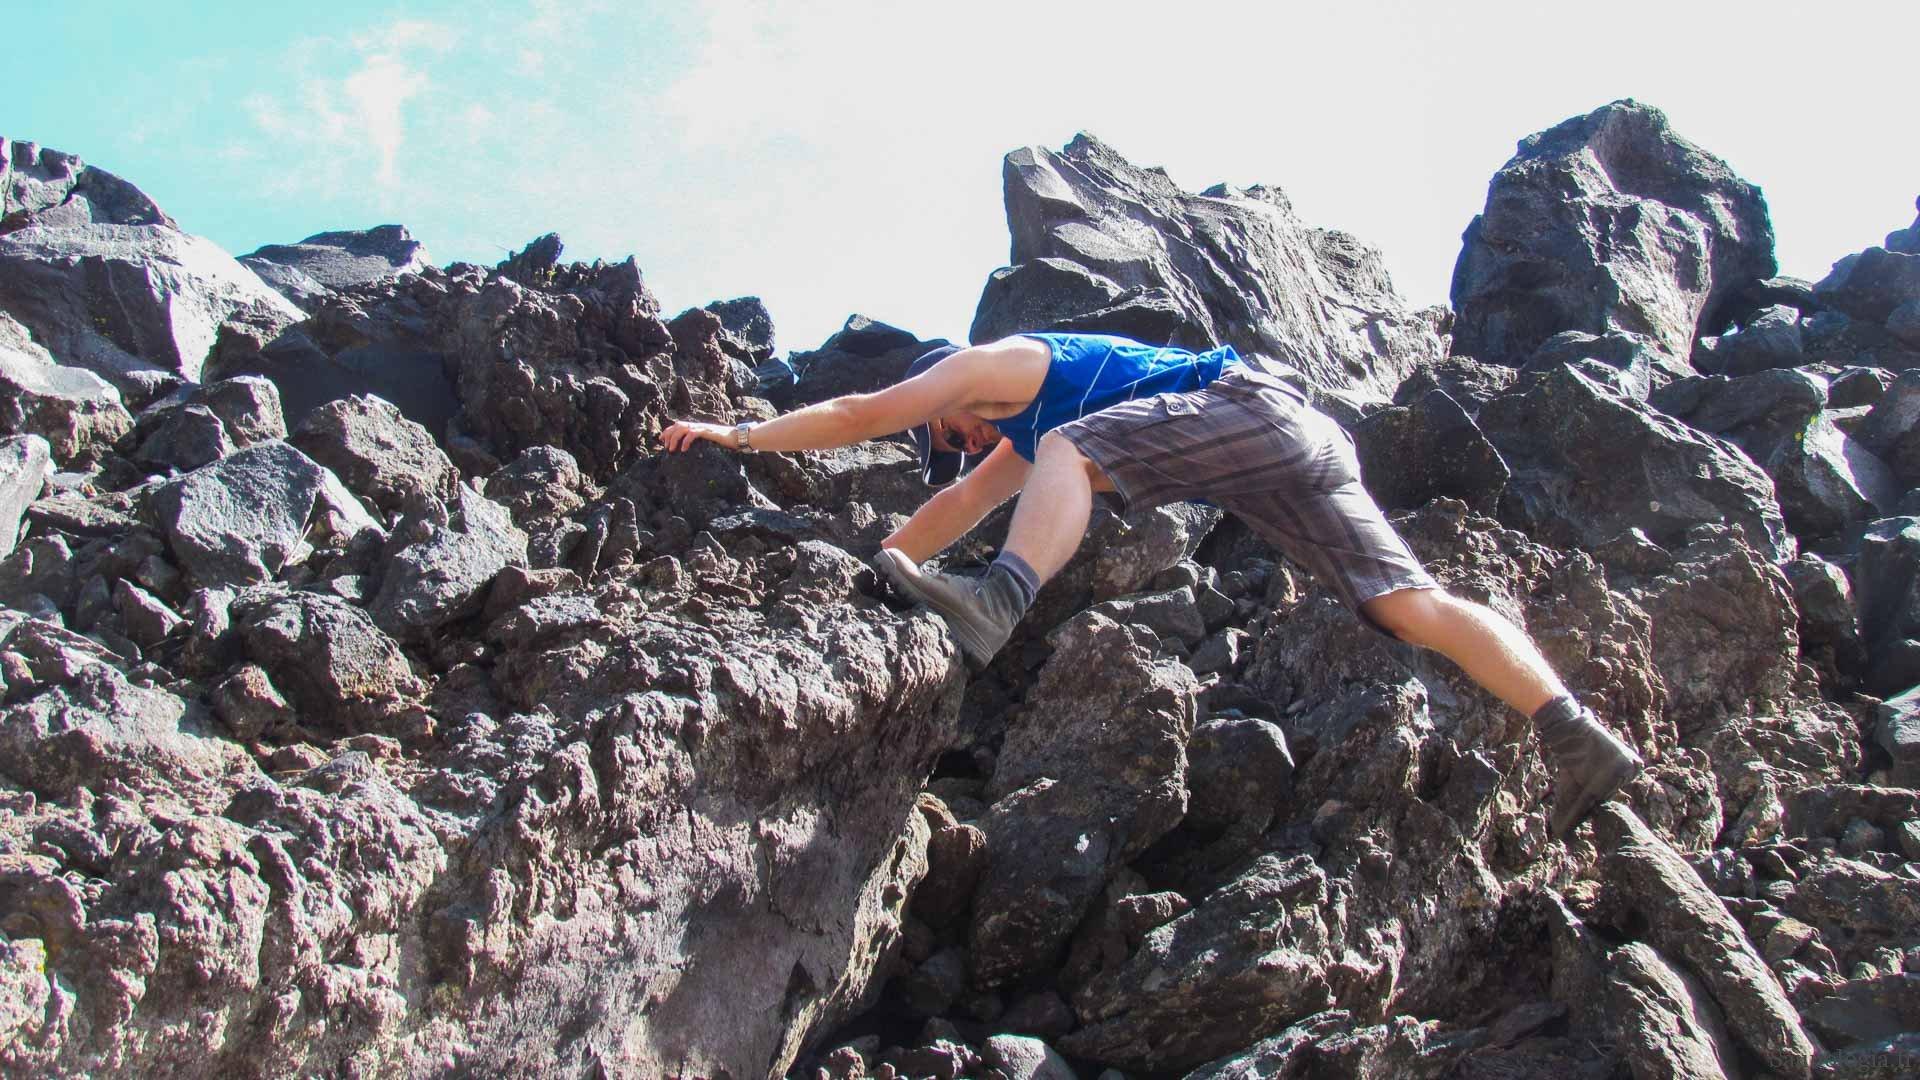 171122-mt-shasta-saunologi-on-the-rocks-1271